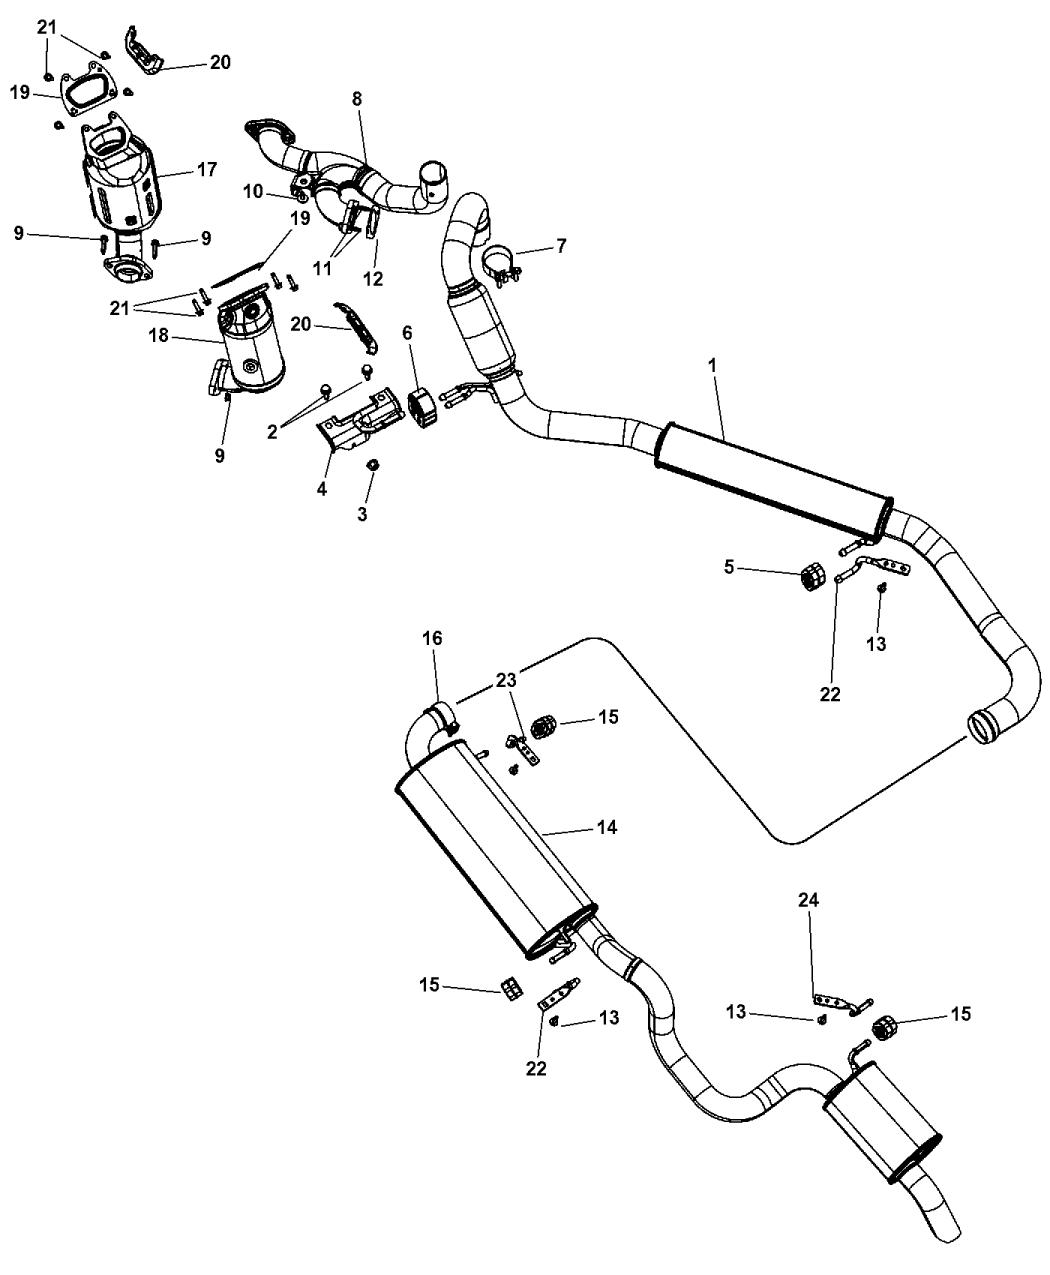 68036150AI - Genuine Chrysler Parts